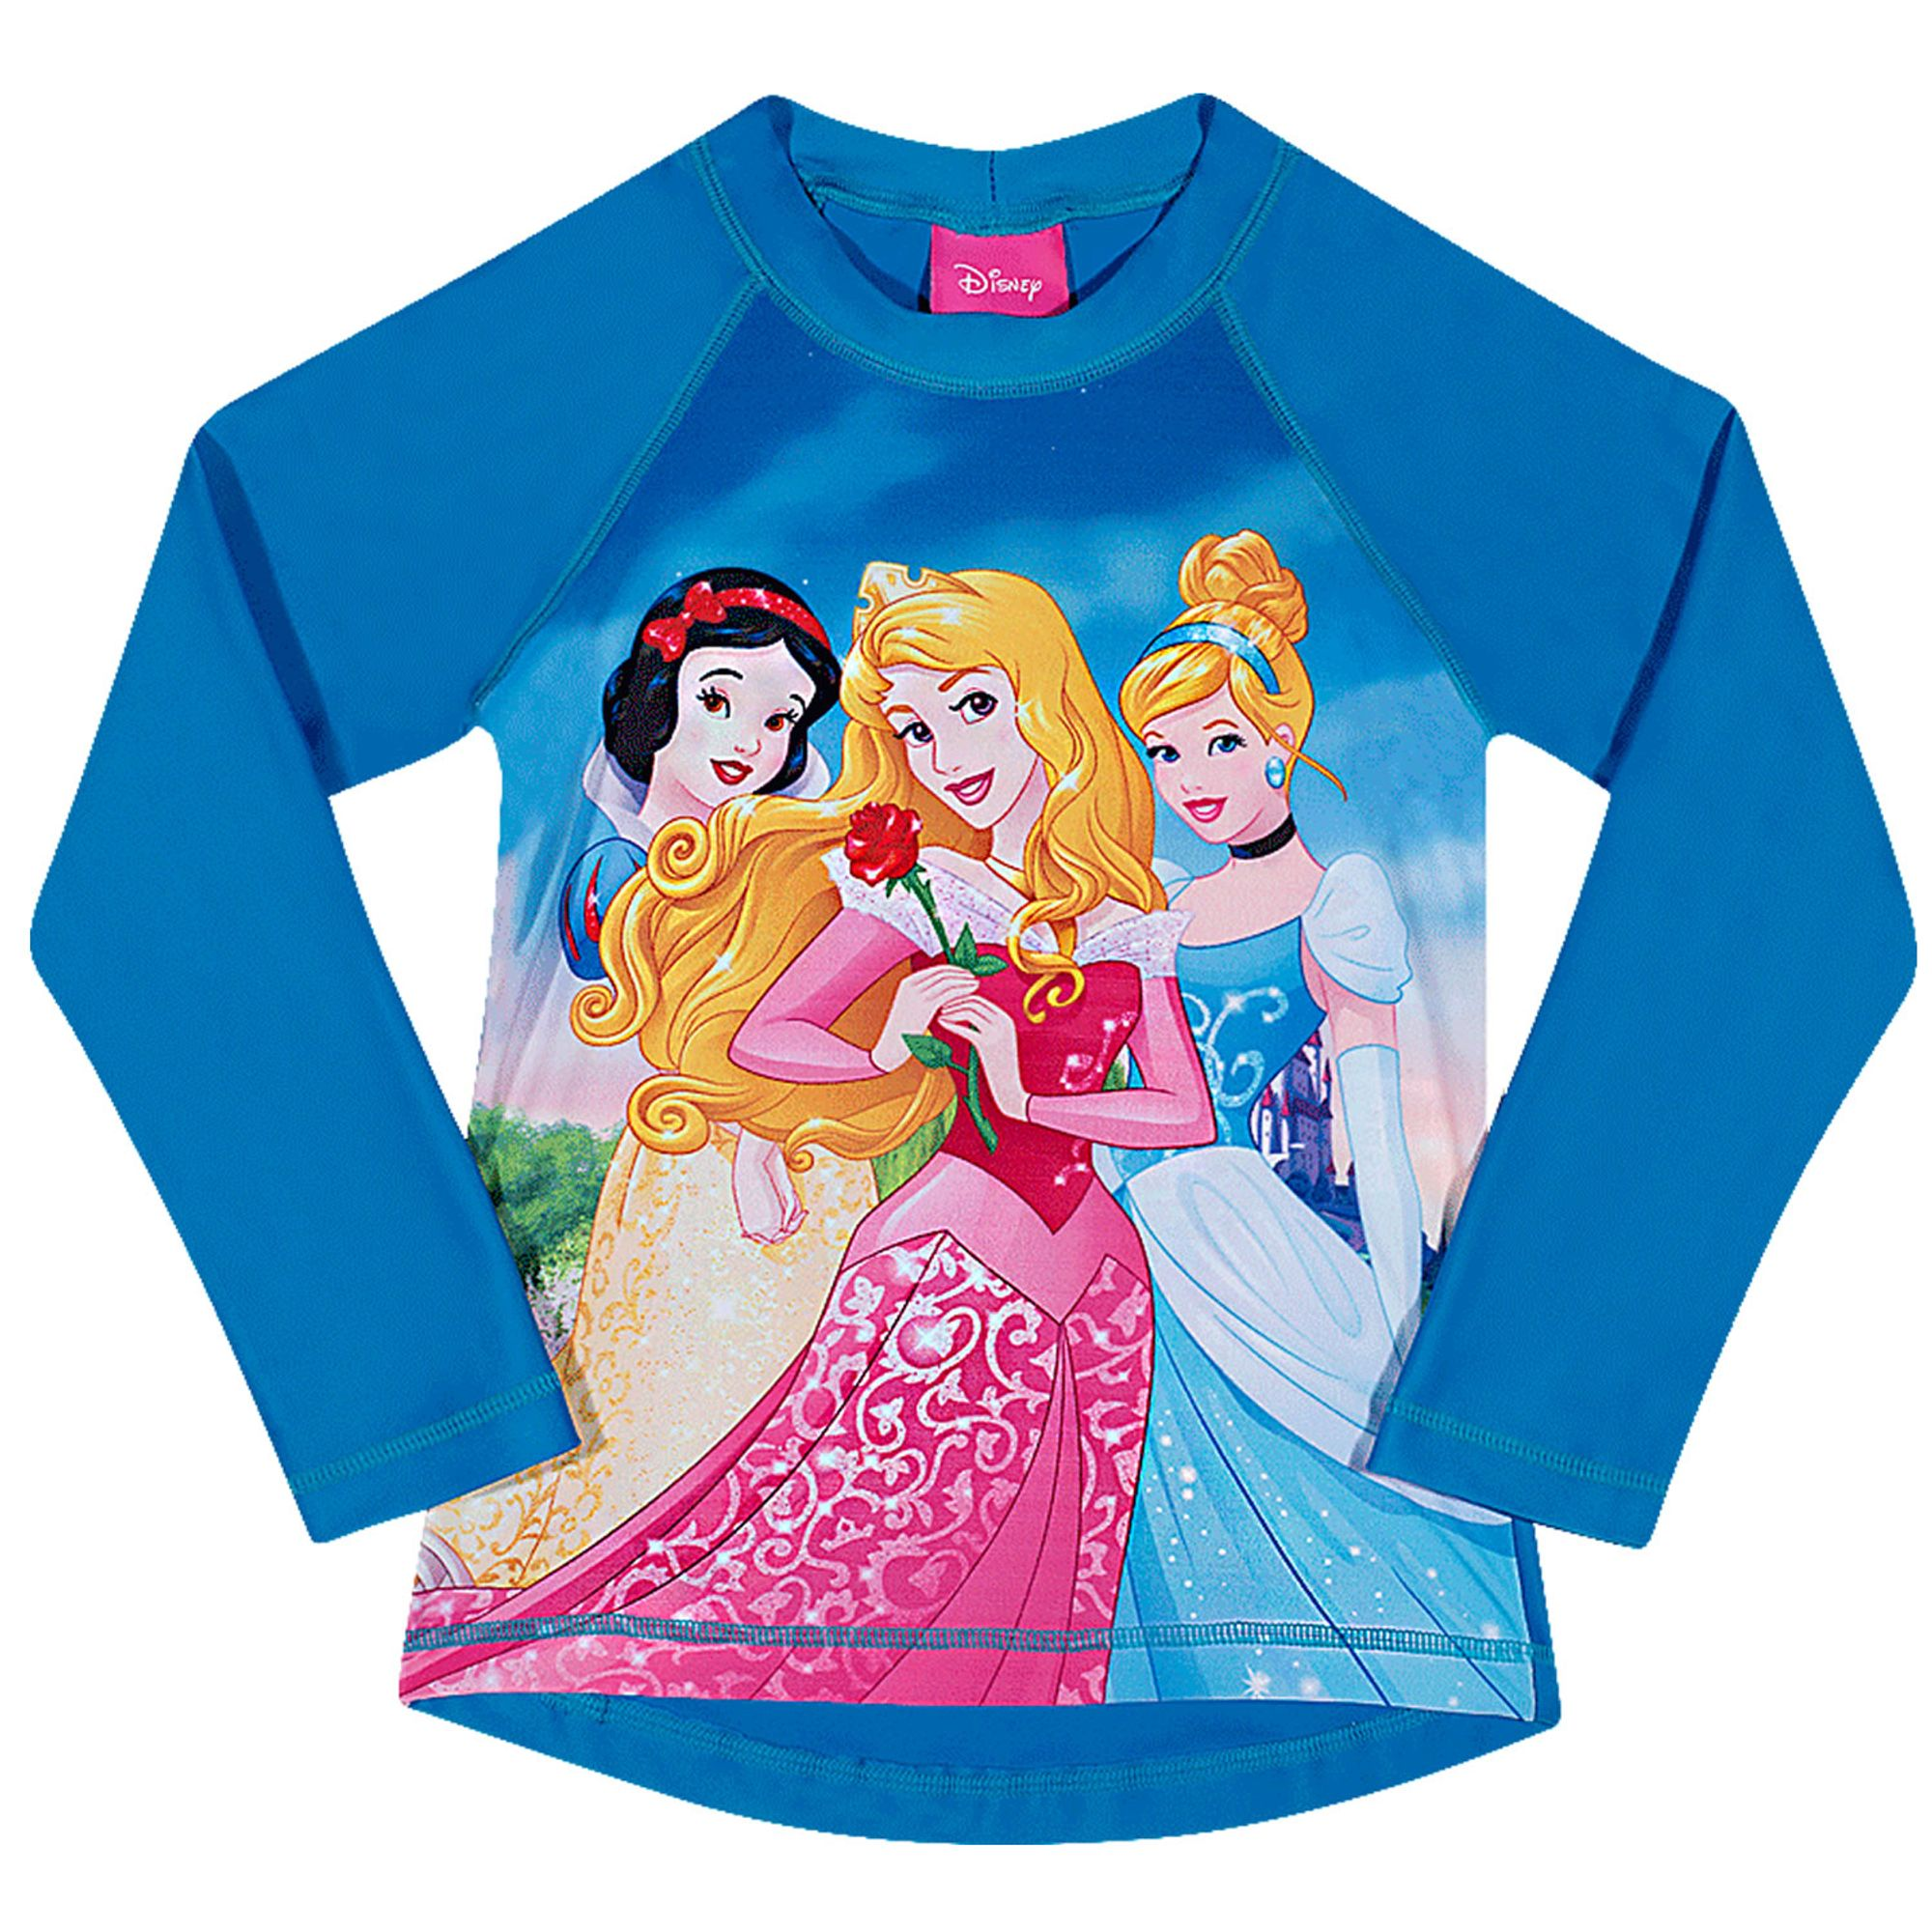 camiseta-infantil-protecao-solar-manga-longa-princesas-disney-azul